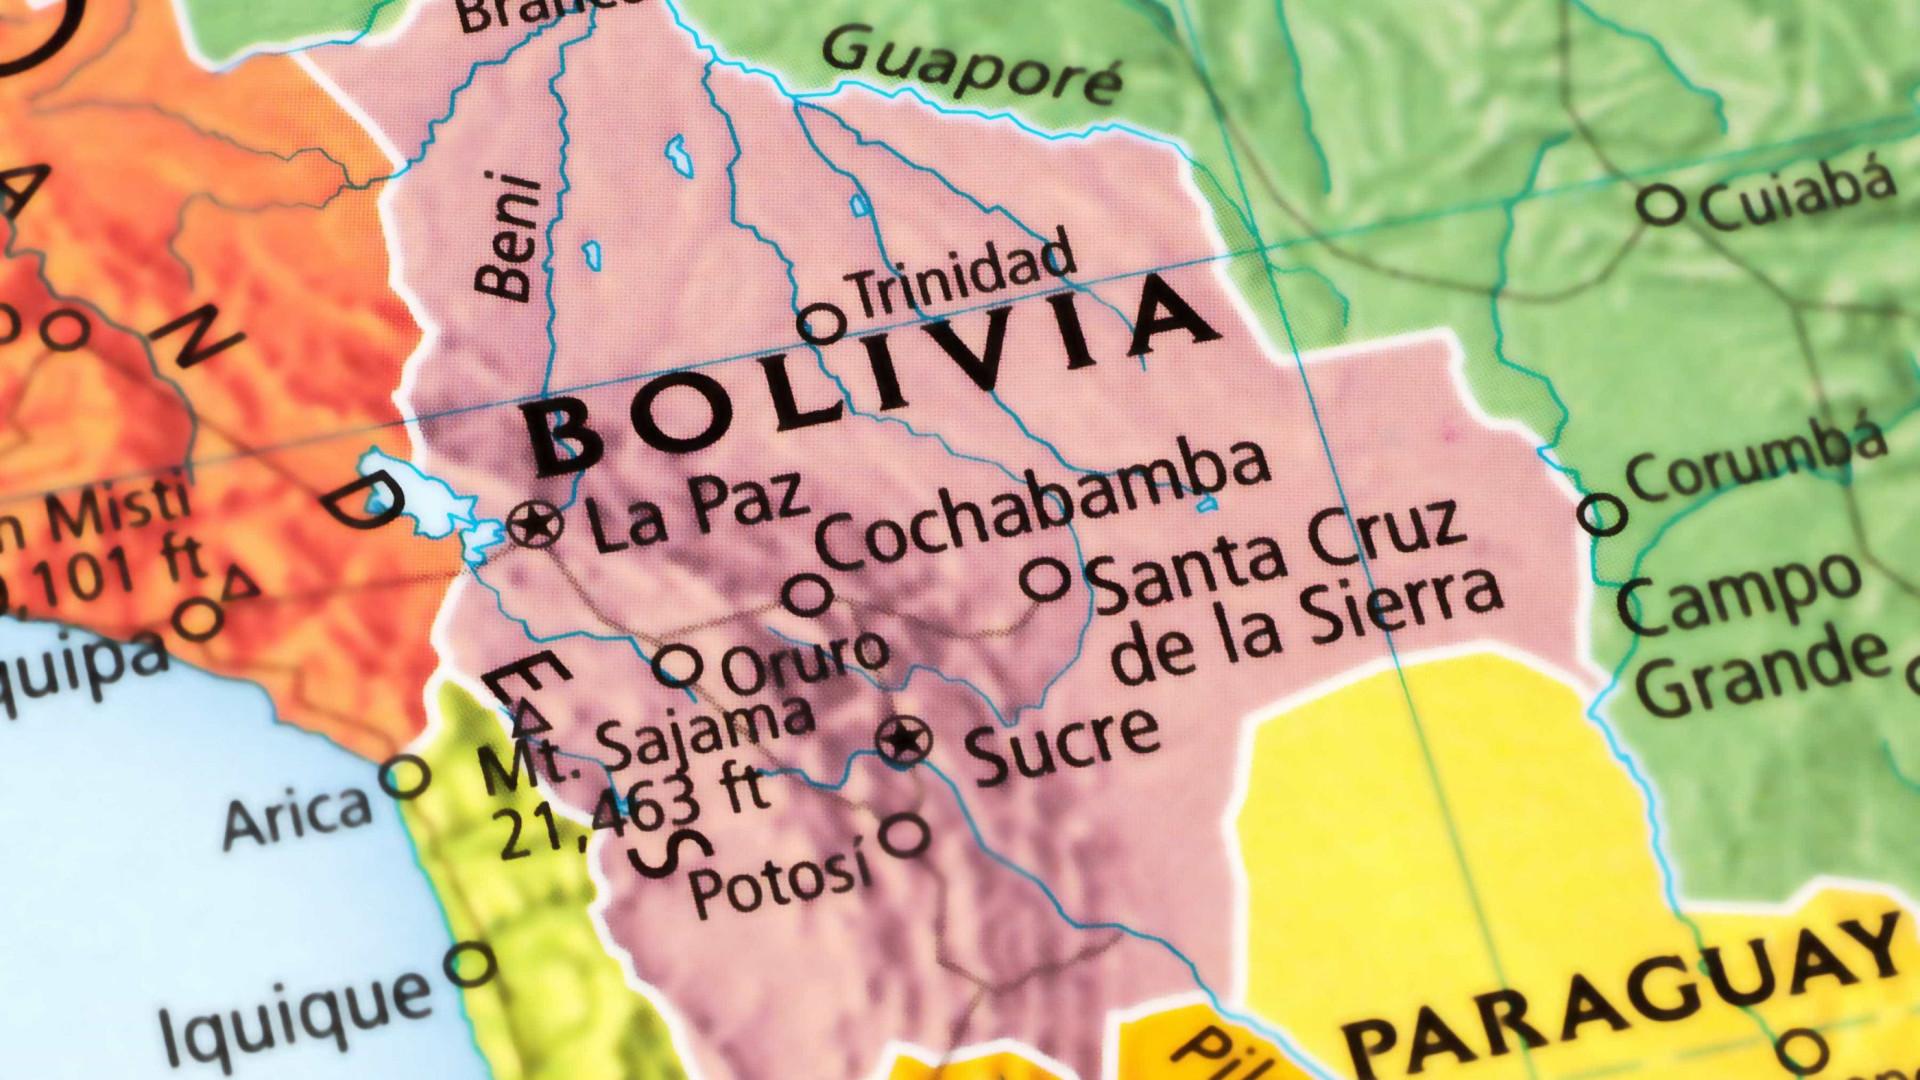 Protestos na Bolívia continuam por exigir renúncia de Morales